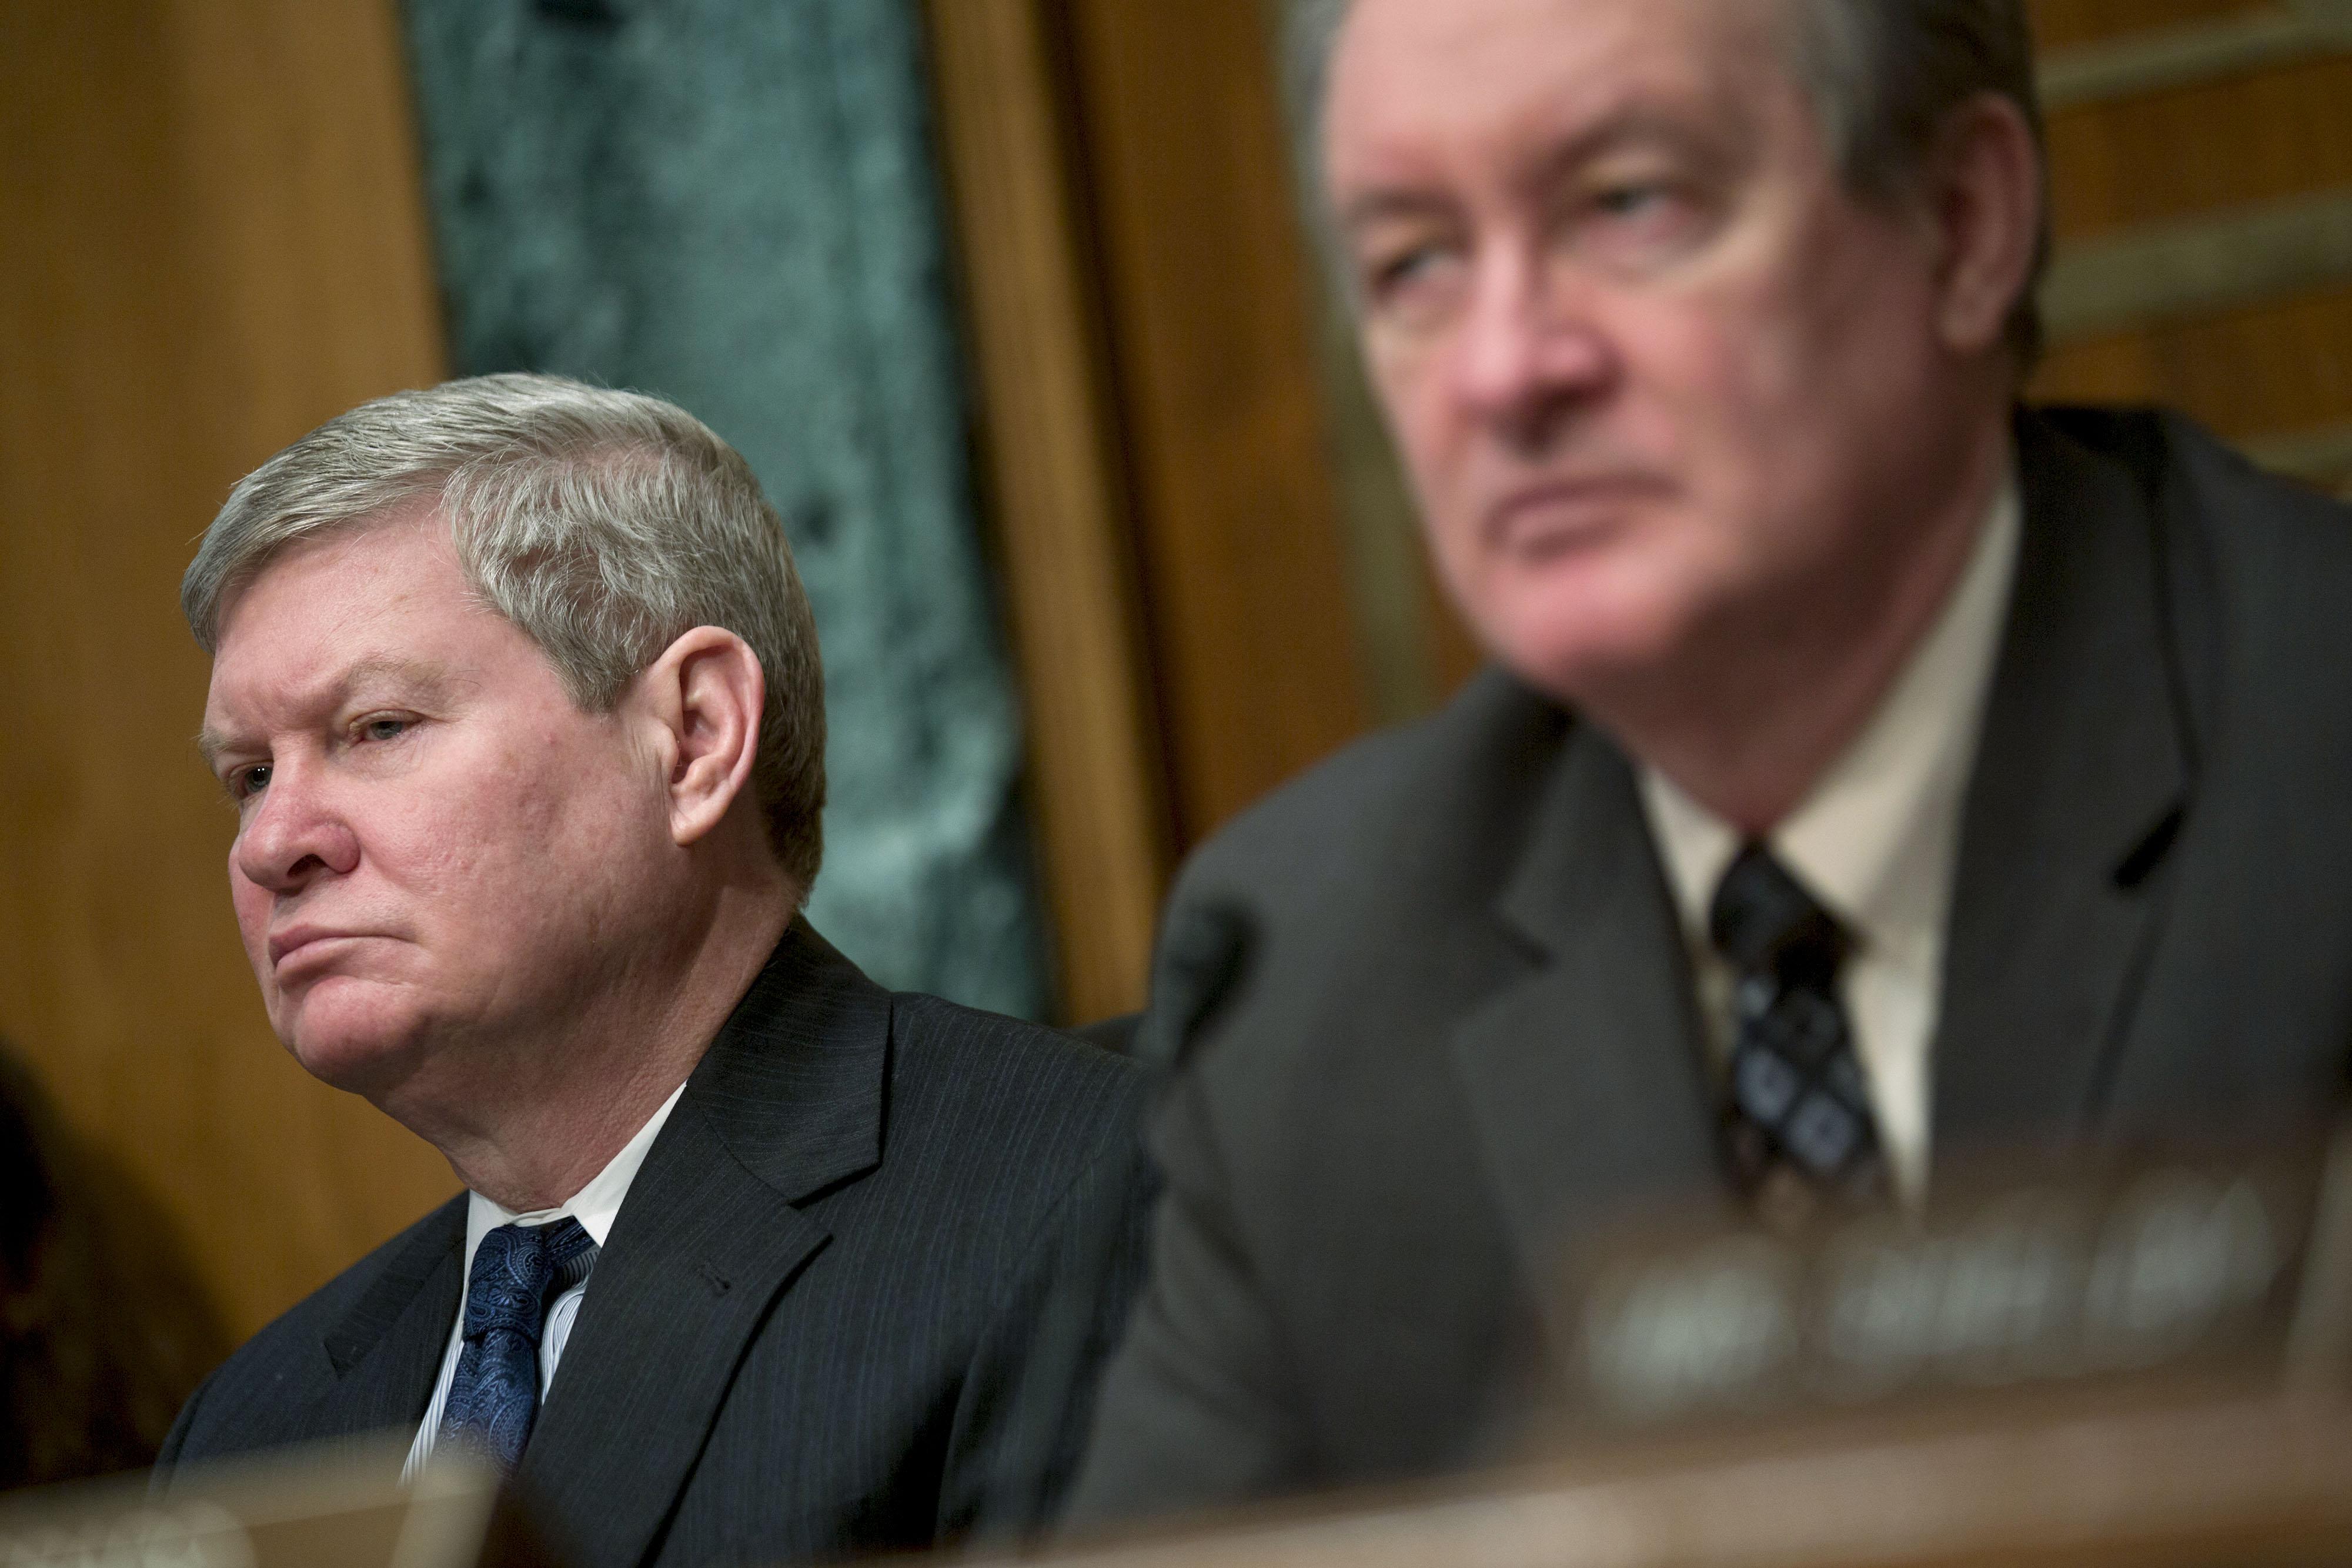 Senator Tim Johnson, chairman of the Senate Banking Committee, left, and Senator Mike Crapo listen during a Senate Banking Committee hearing in Washington, Feb. 27, 2014.